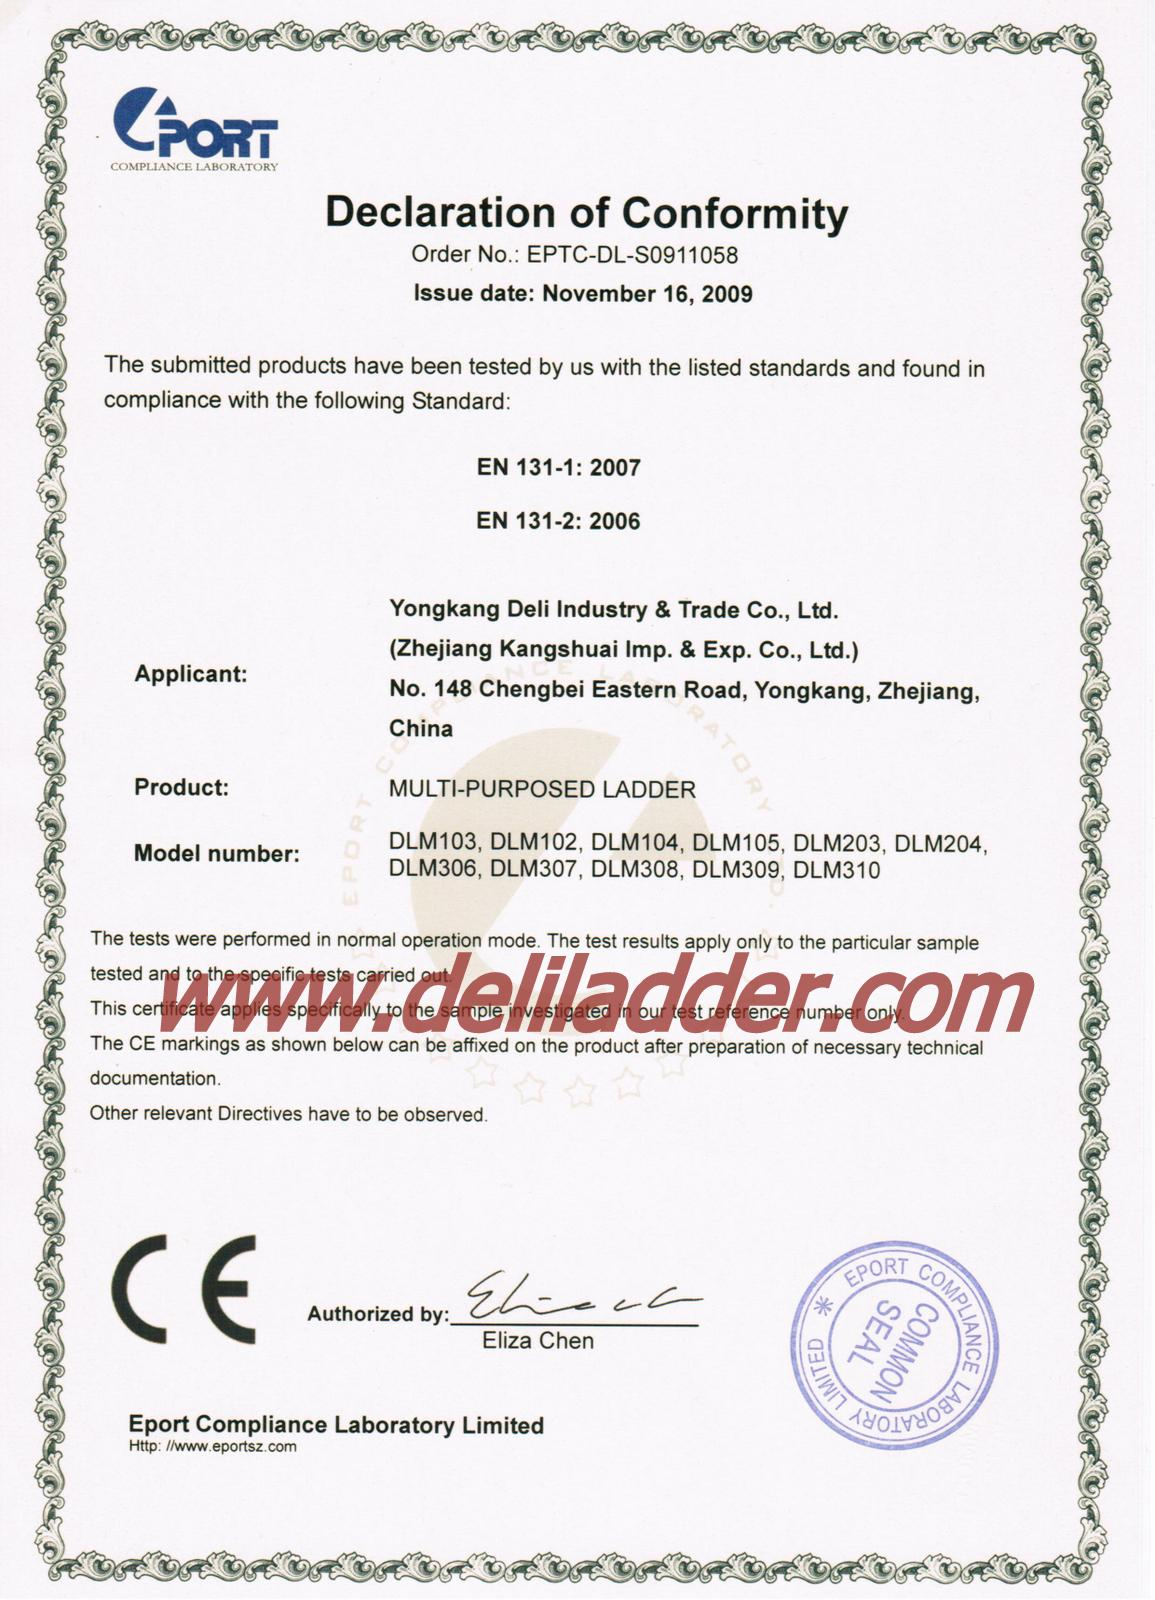 Mulit-function ladder EN 131 certificate